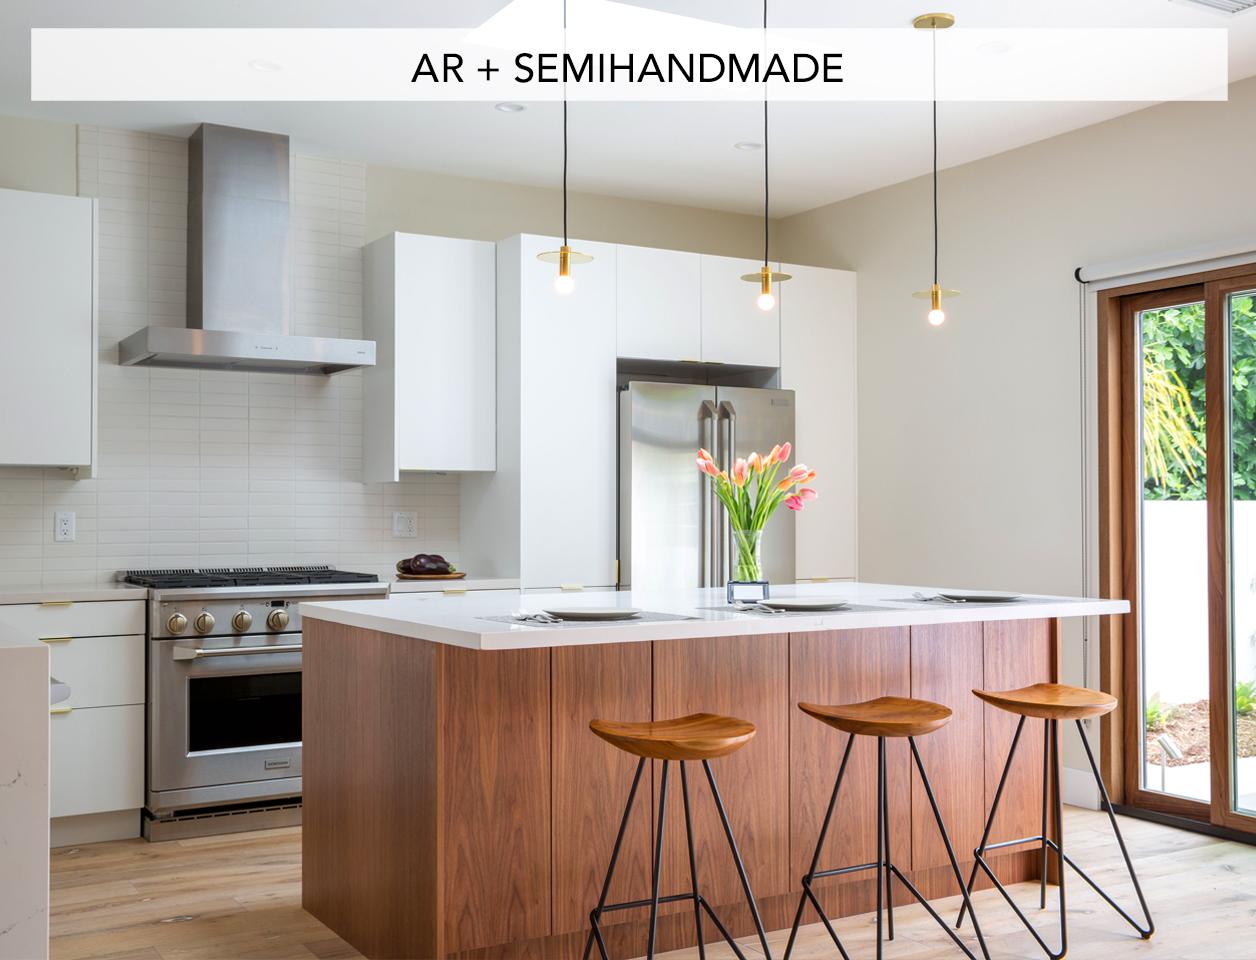 IKEA Kitchen cabinets, after market doors, custom doors from Semihand made